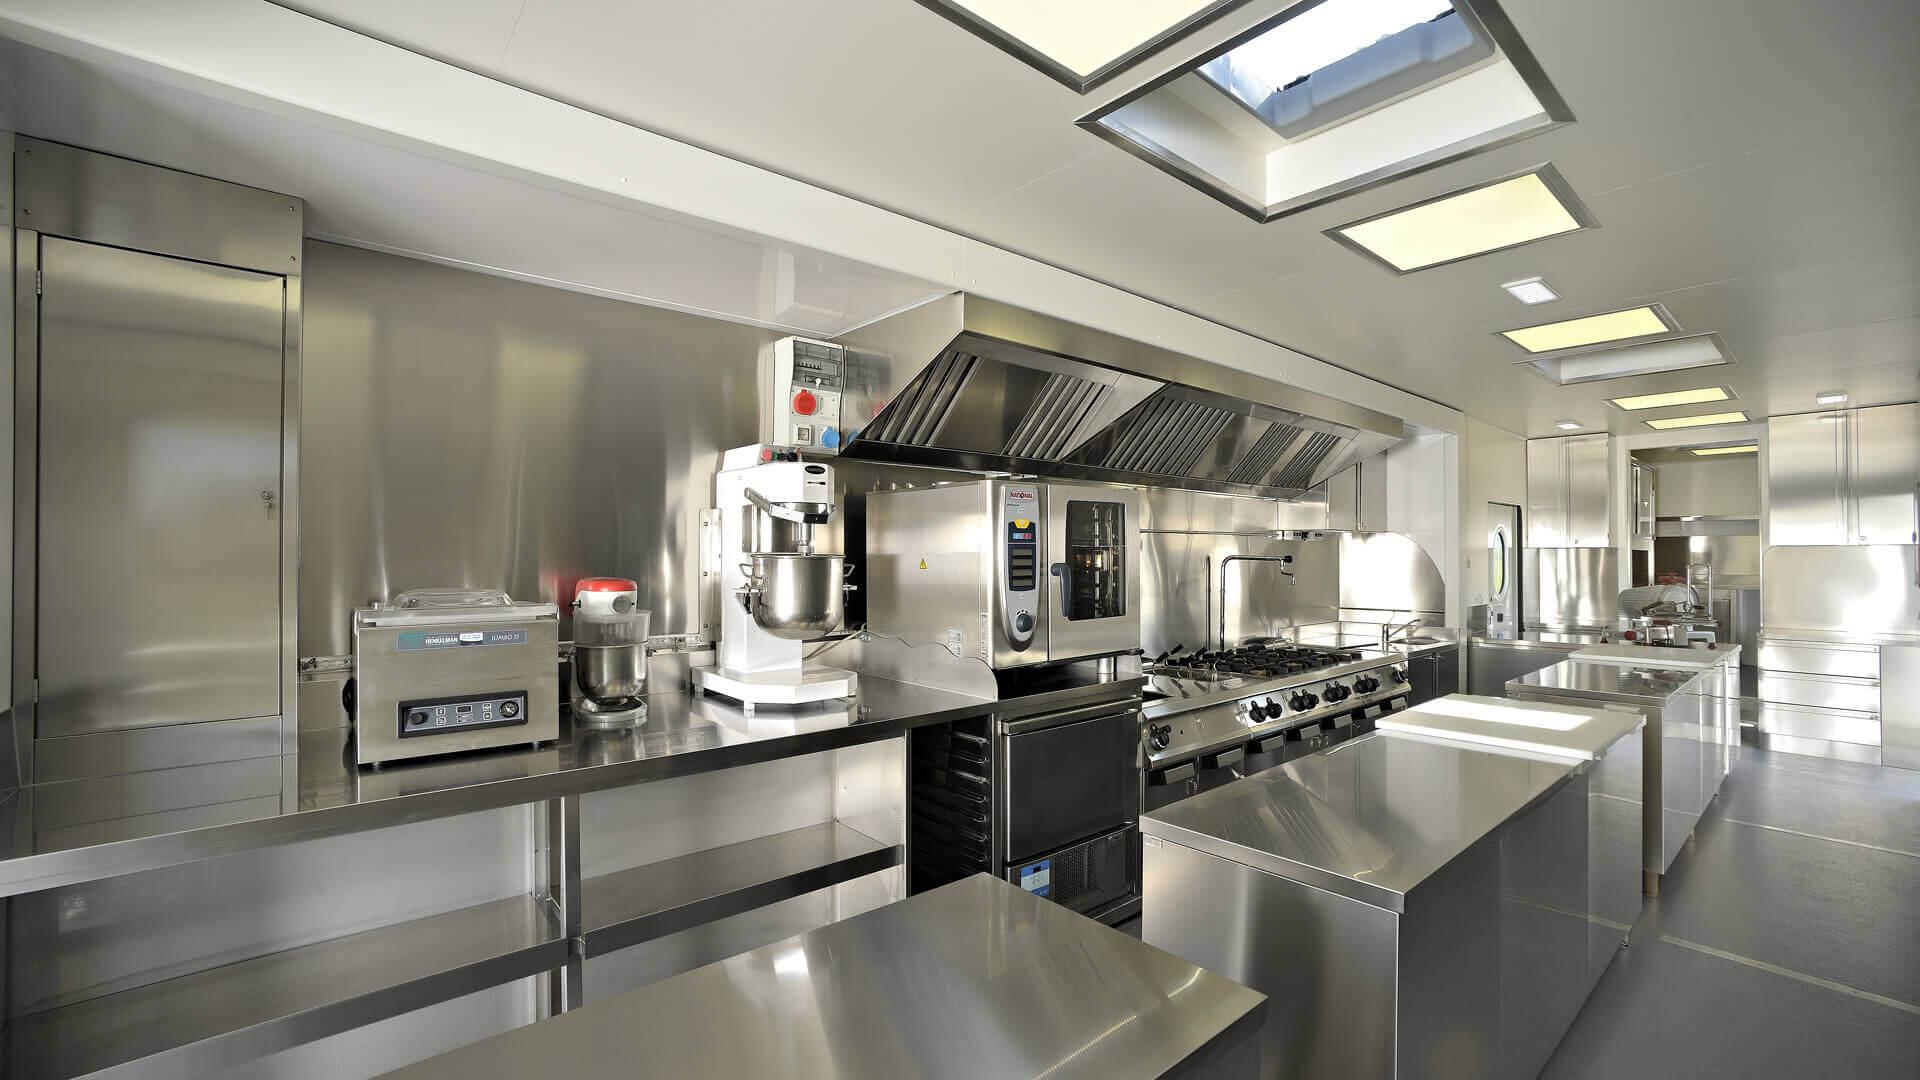 Cucina Mobile Villa Clizia